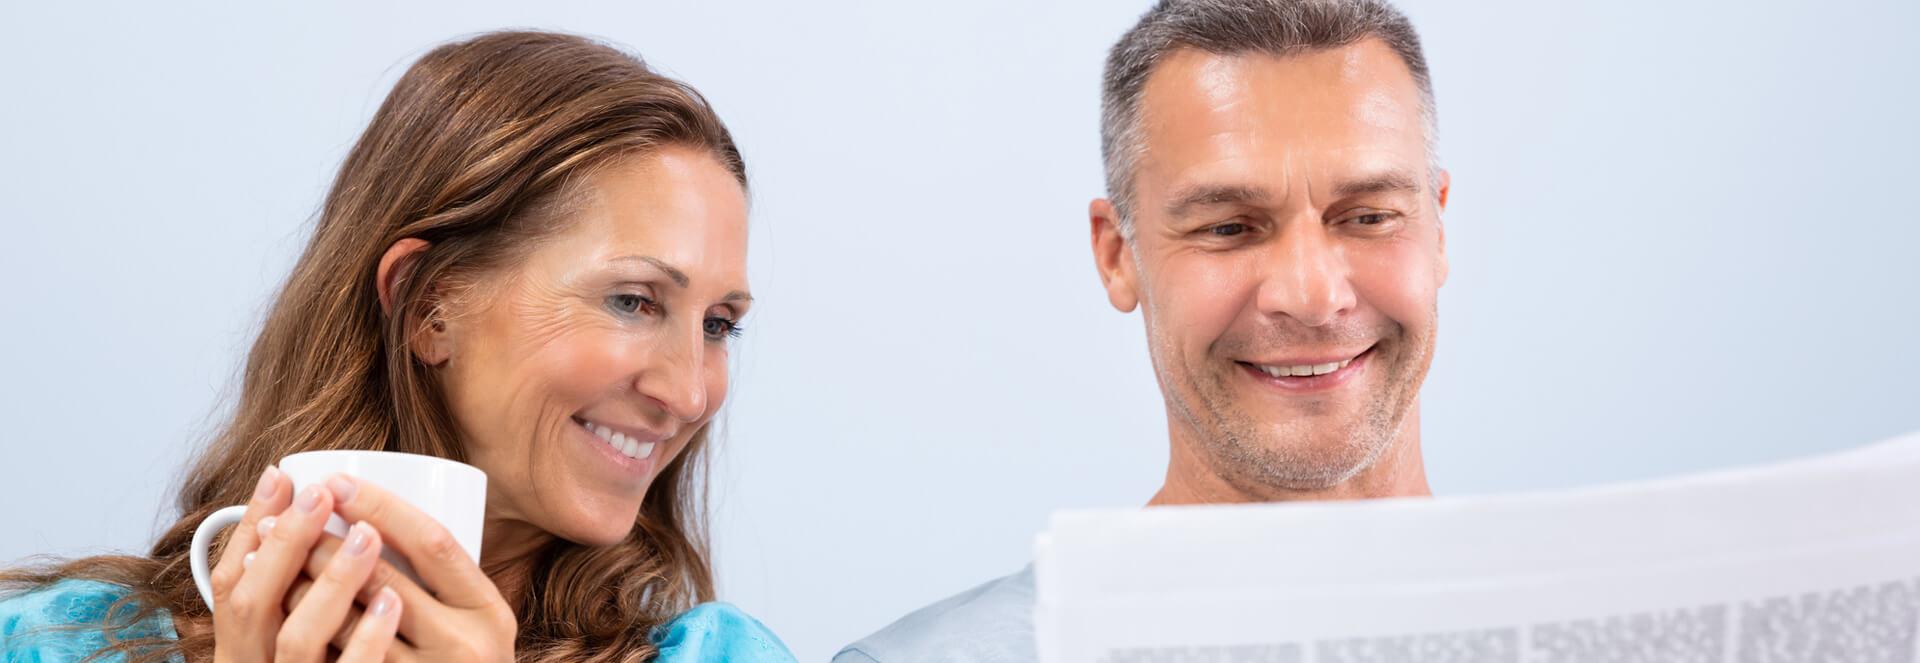 Boulevard Dental - Blog